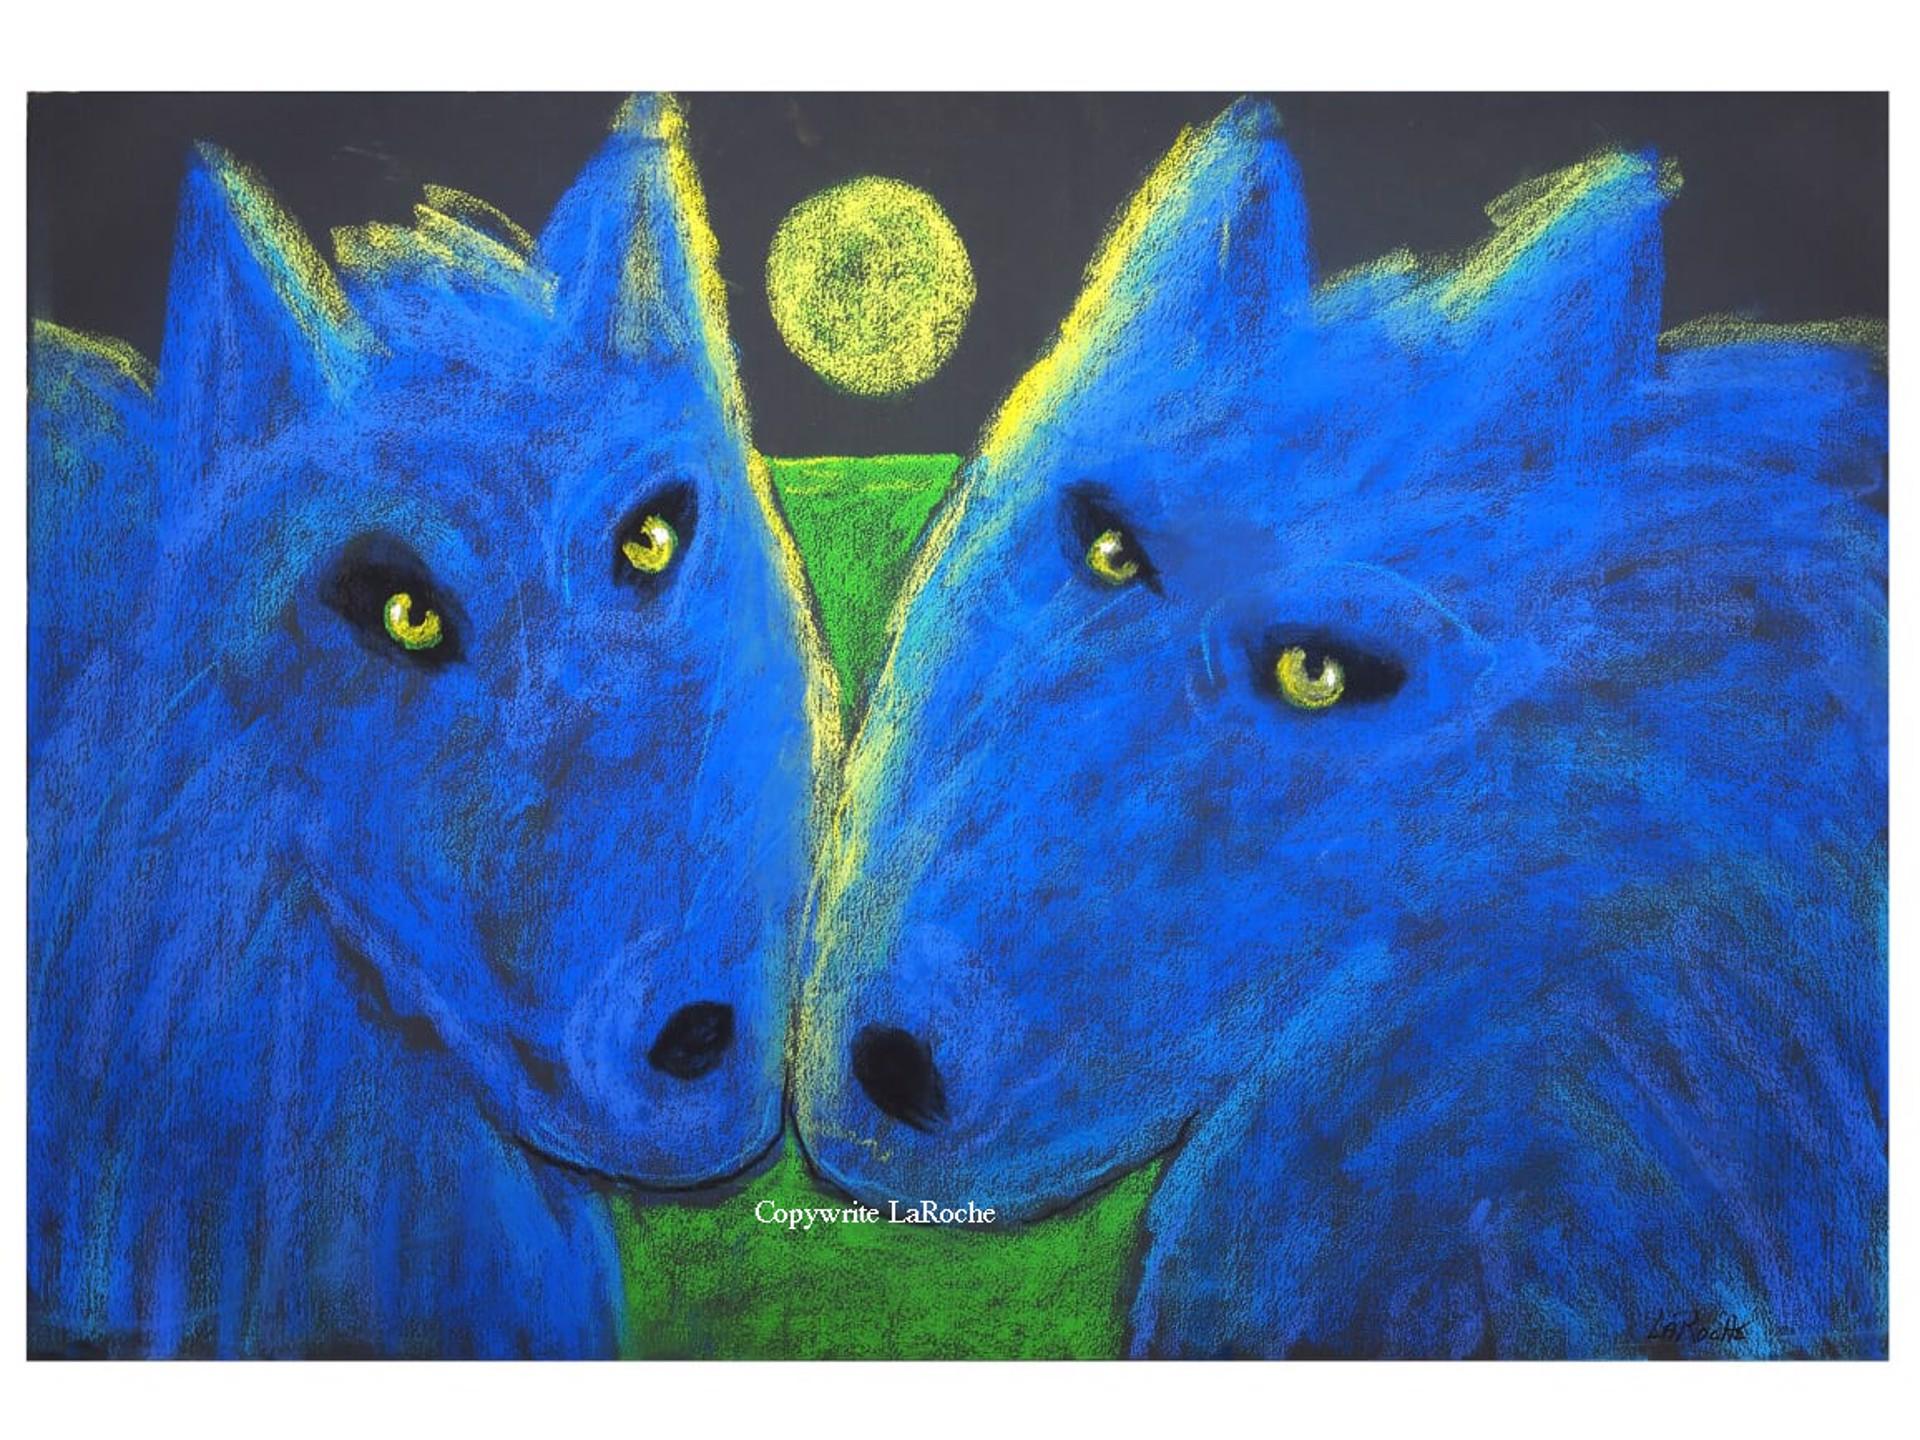 Wild Blue Soulmates by Carole LaRoche